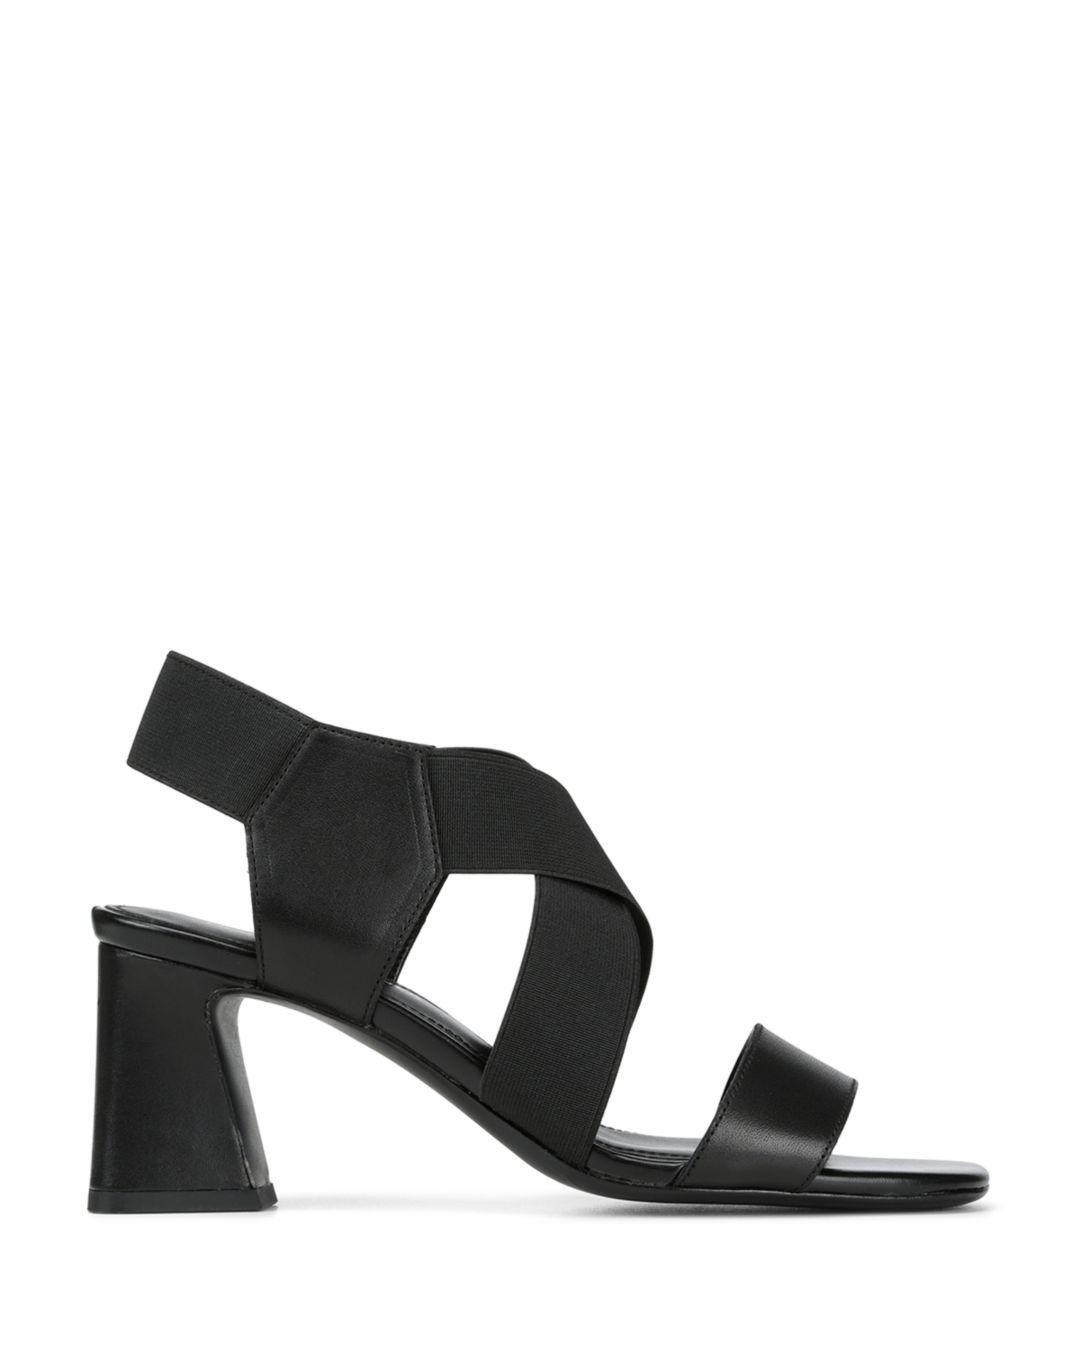 375a674ac2a3 Donald J Pliner Vikki Leather   Stretch Dress Block Heel Sandals in Black -  Lyst